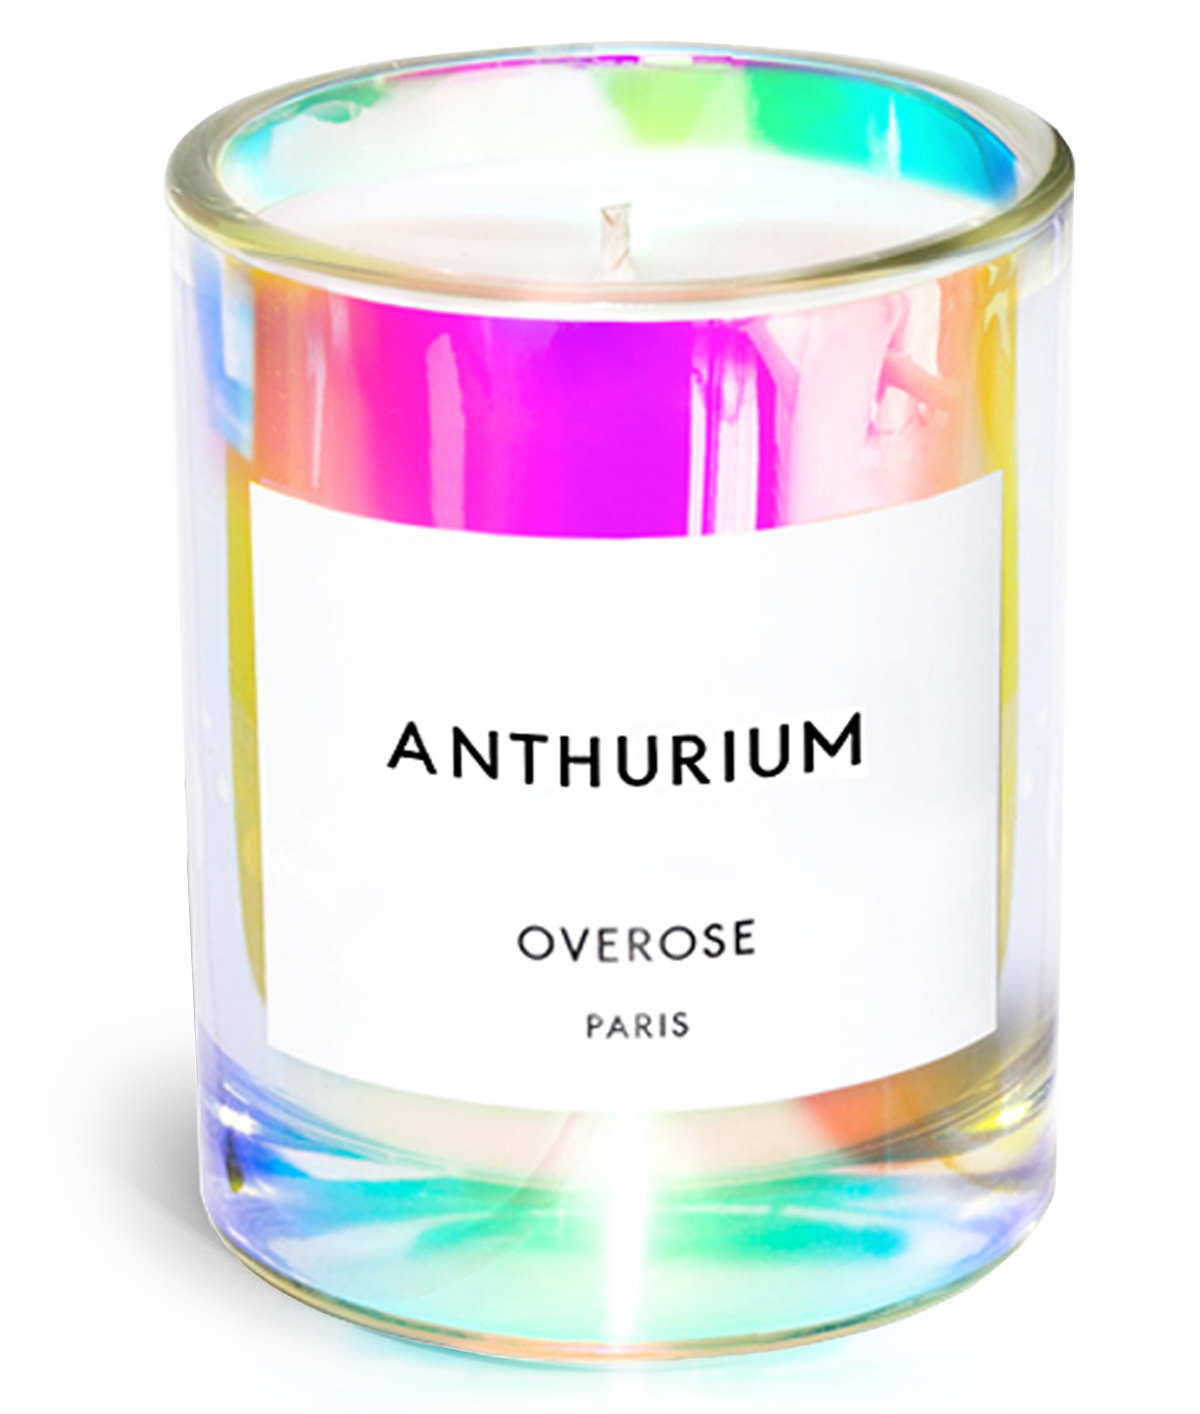 Overose Anthurium Candle, $68